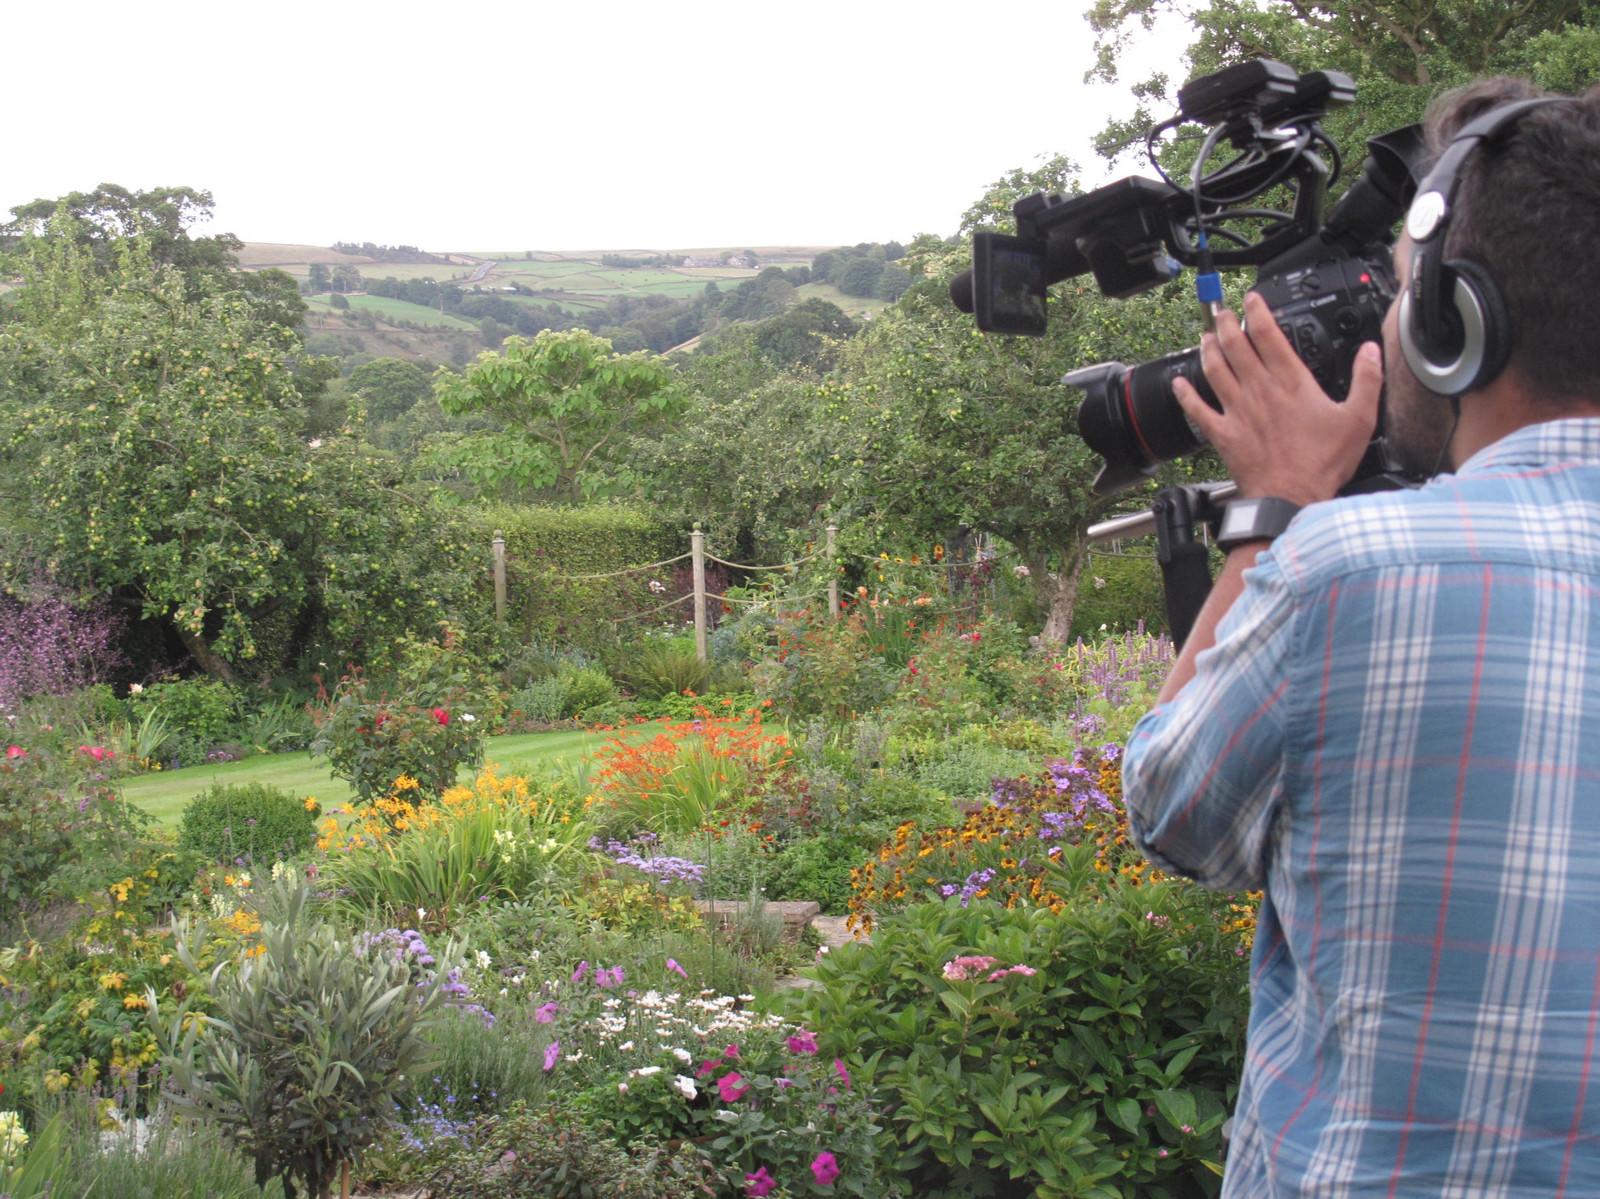 TV cameraman filming garden